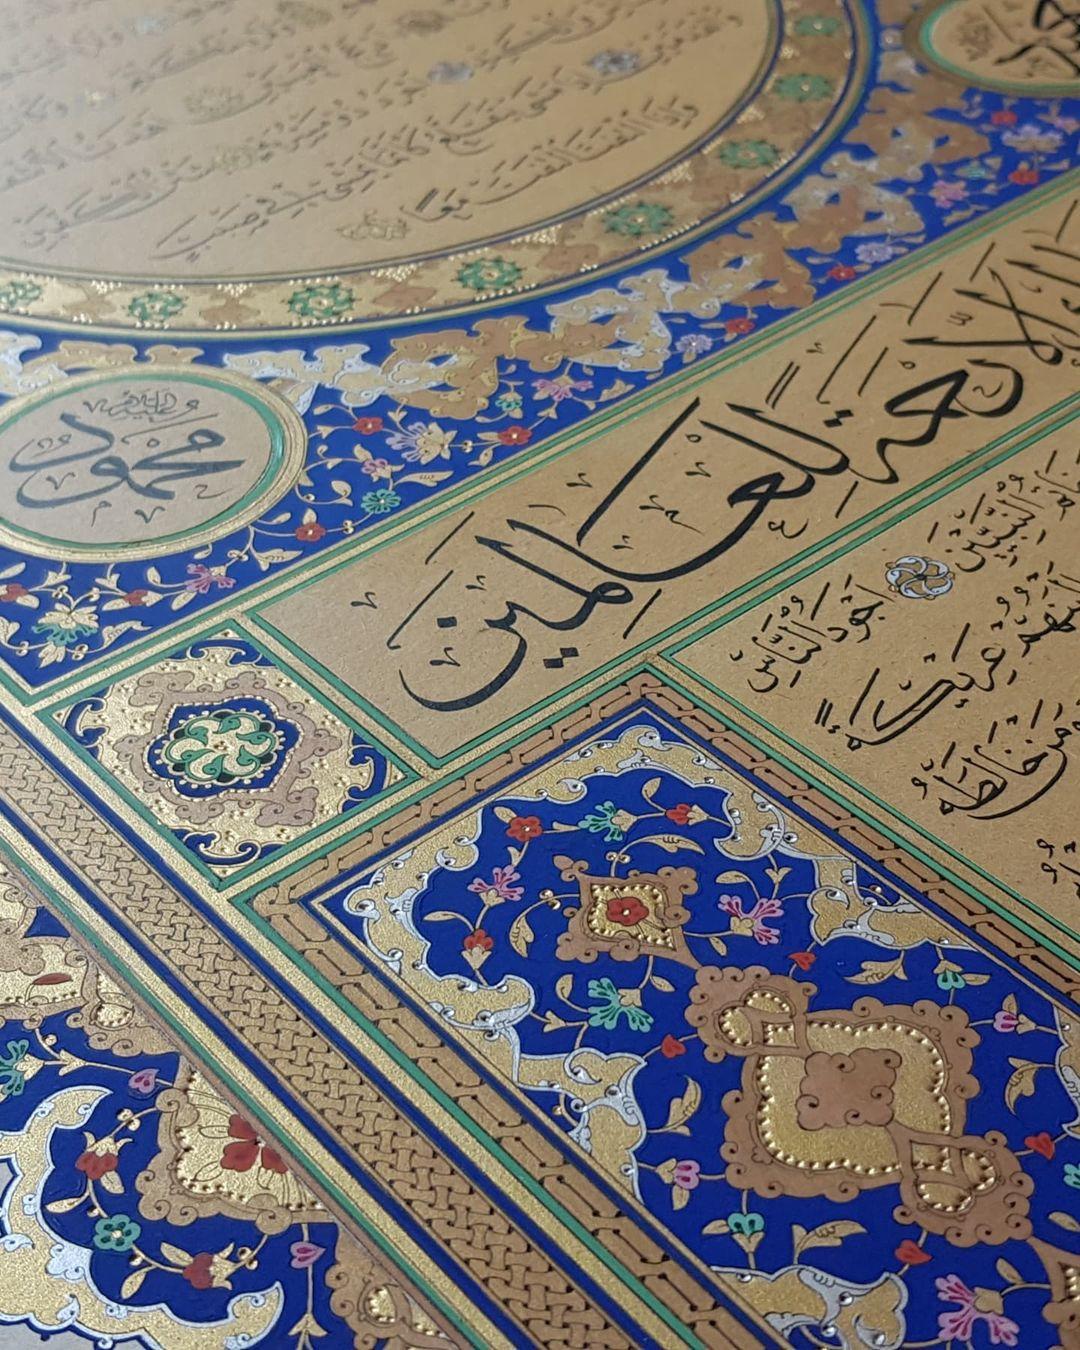 khat/hat/kat Tsulust/Thuluth Mothana Alobaydi حلية جديدة مذهبة design of zagrfa is for @sayin.ayse... 1131 3